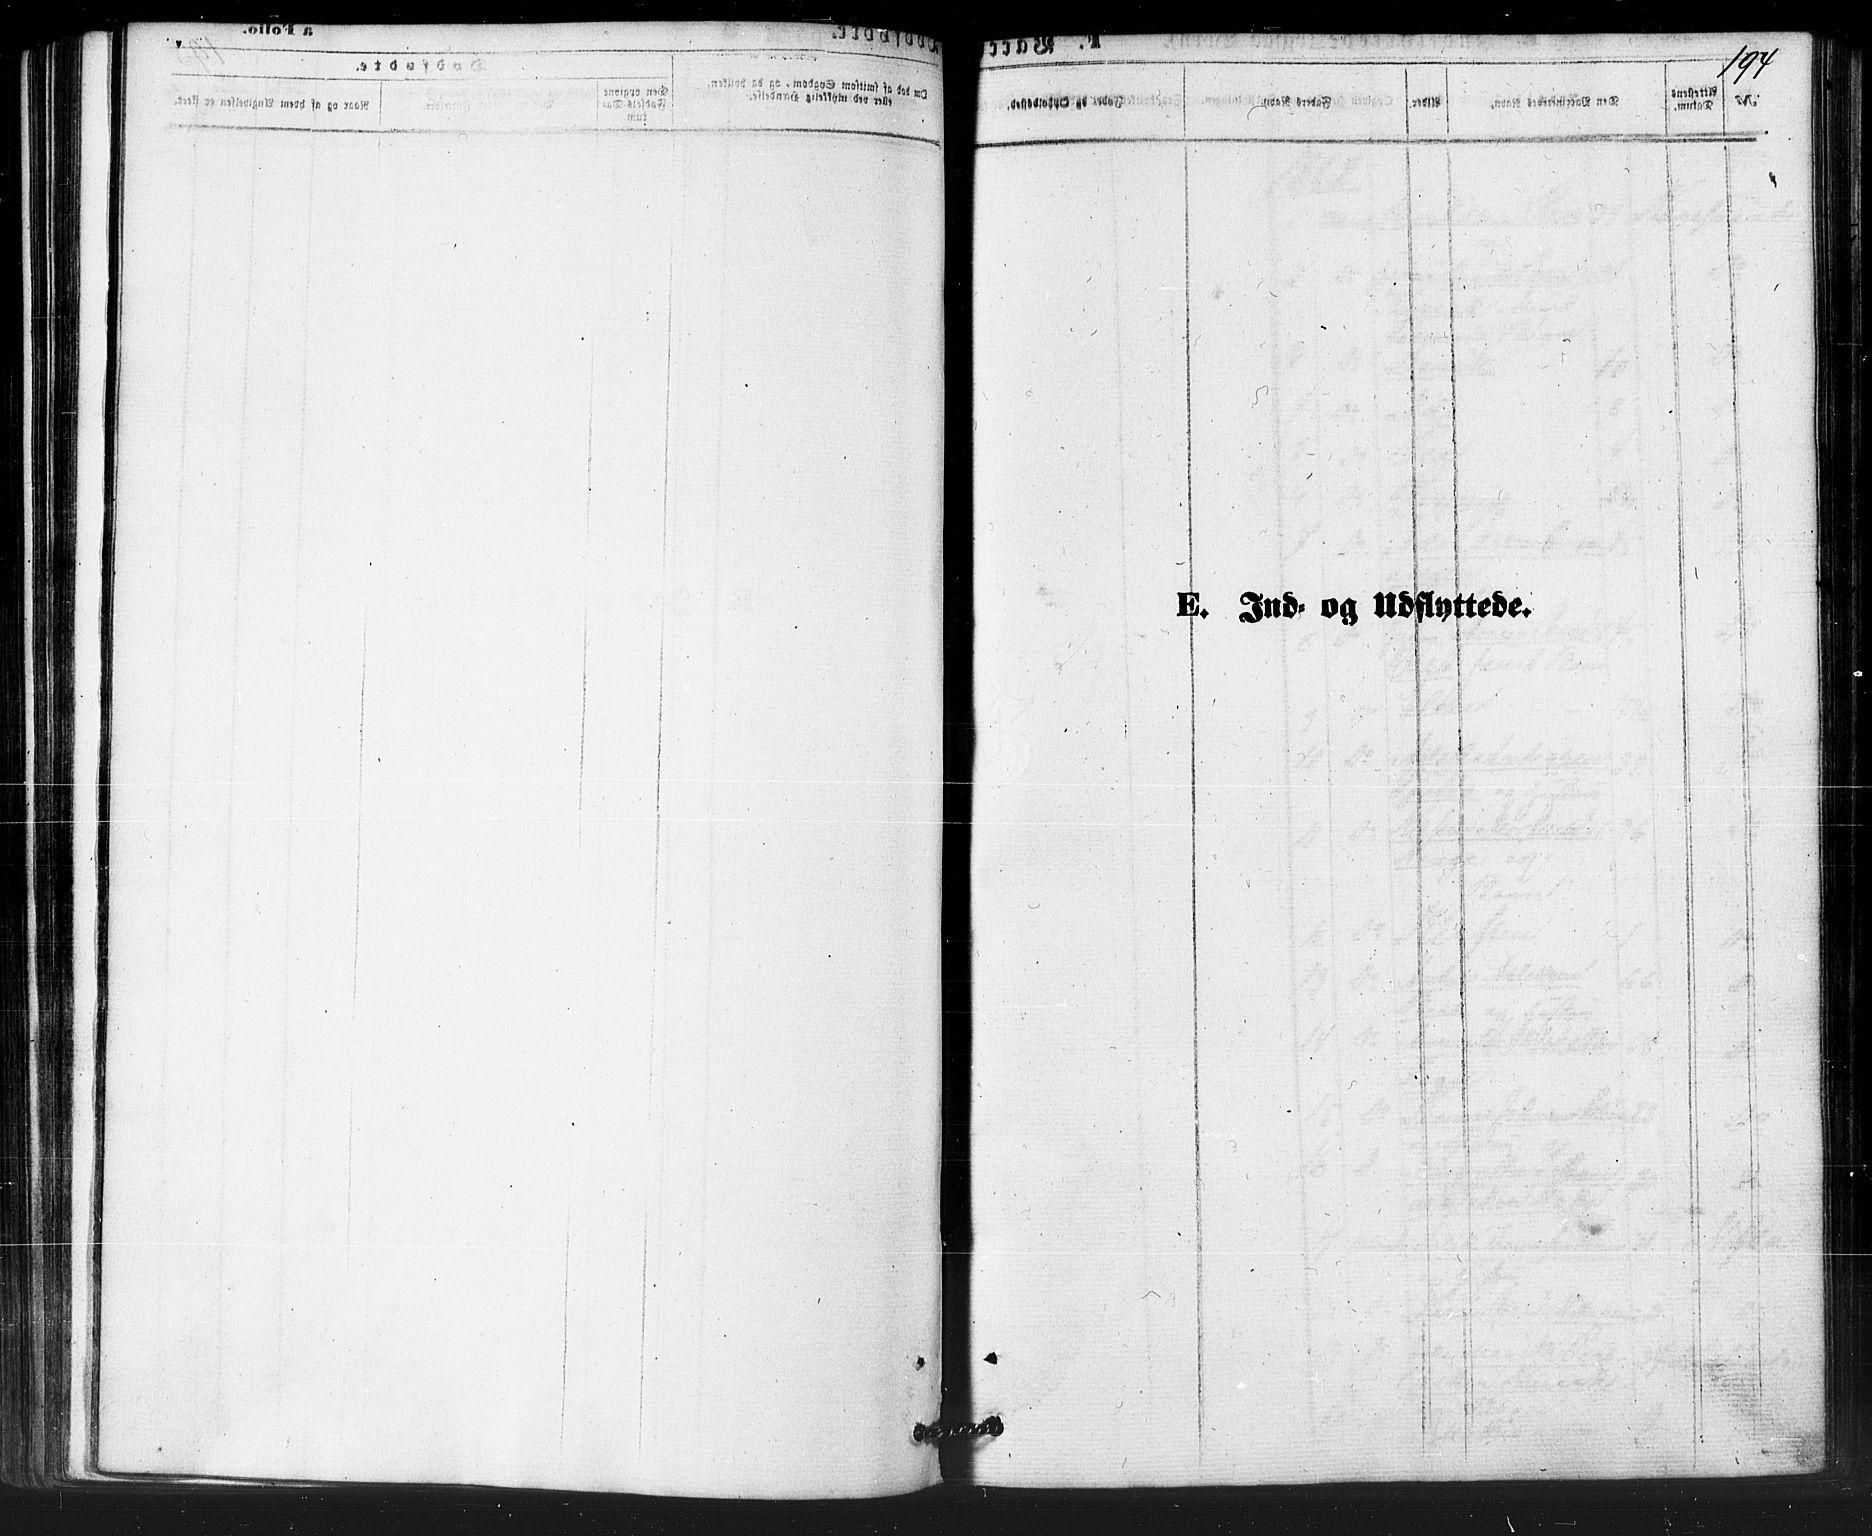 SATØ, Kautokeino sokneprestembete, H/Ha/L0003.kirke: Ministerialbok nr. 3, 1862-1879, s. 194